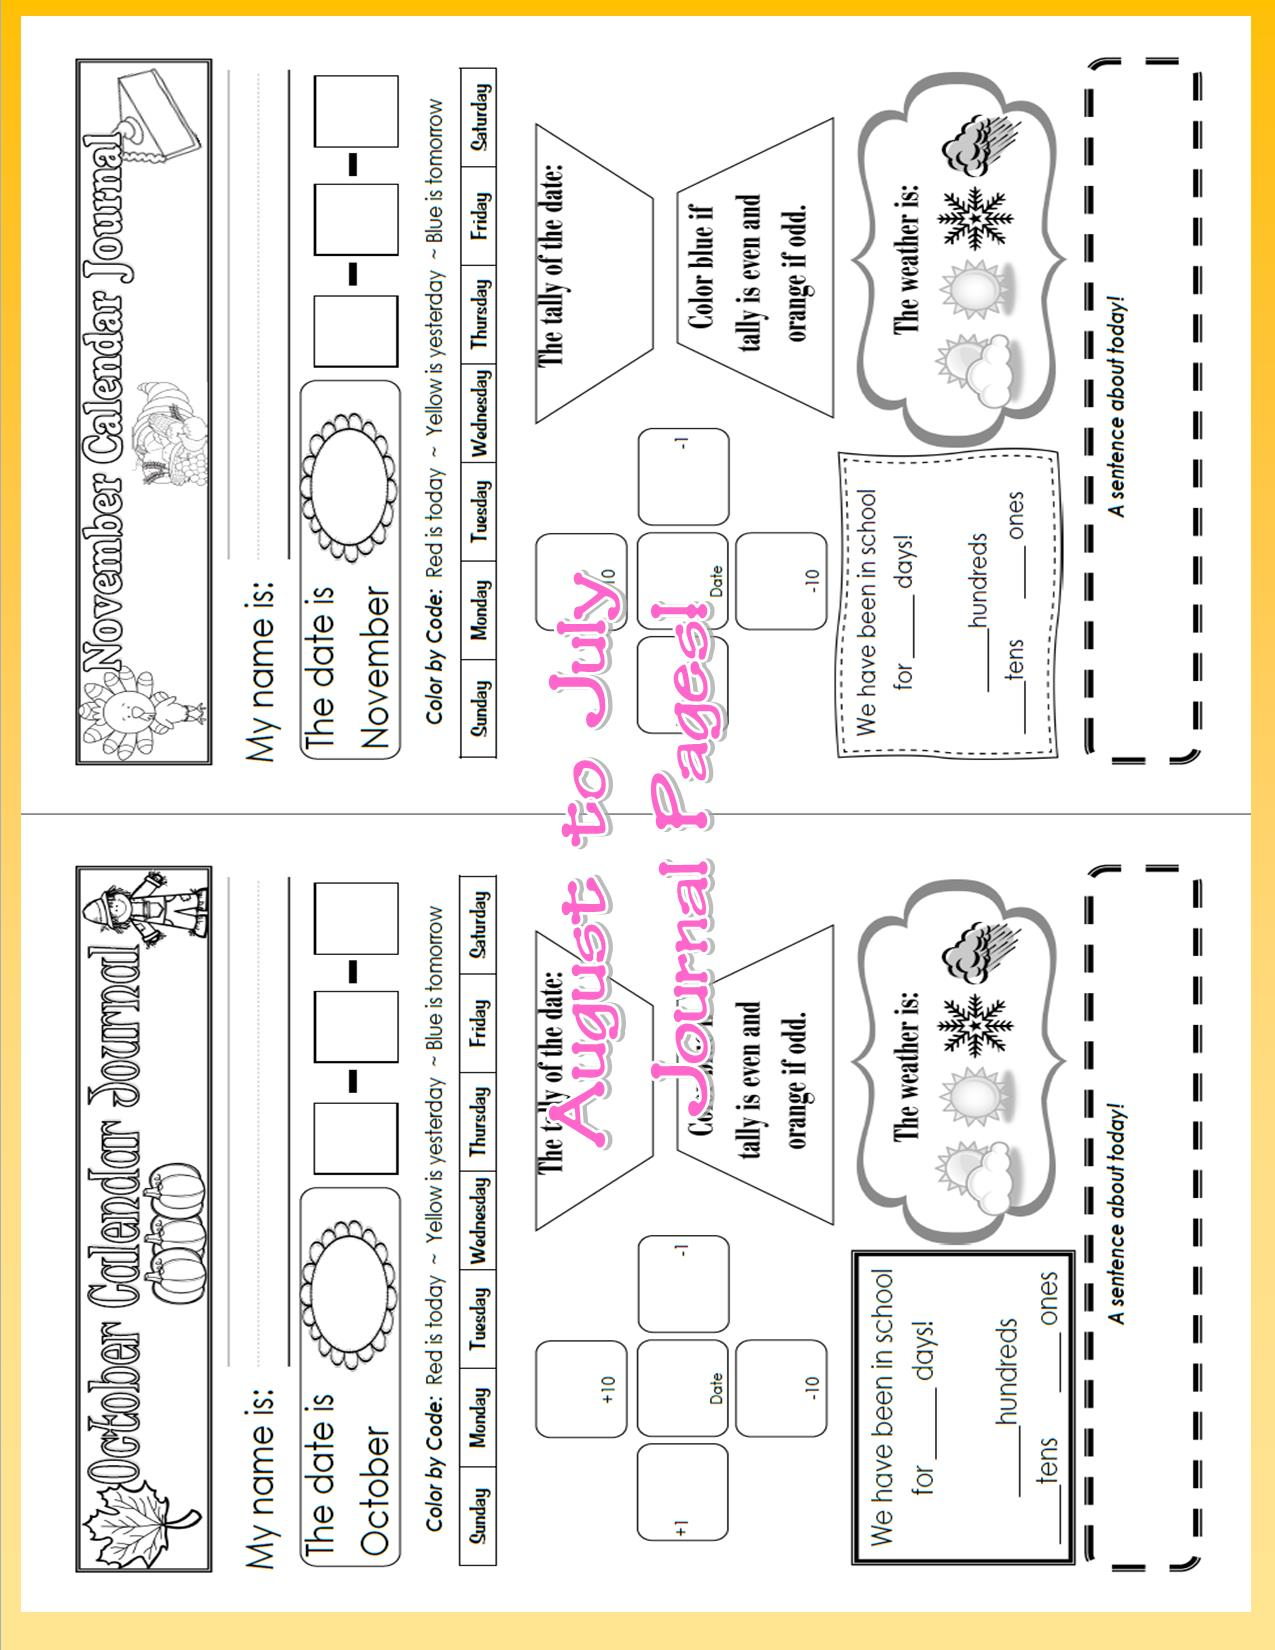 Calendar Activities For First Grade : Printable calendar activities for first grade the